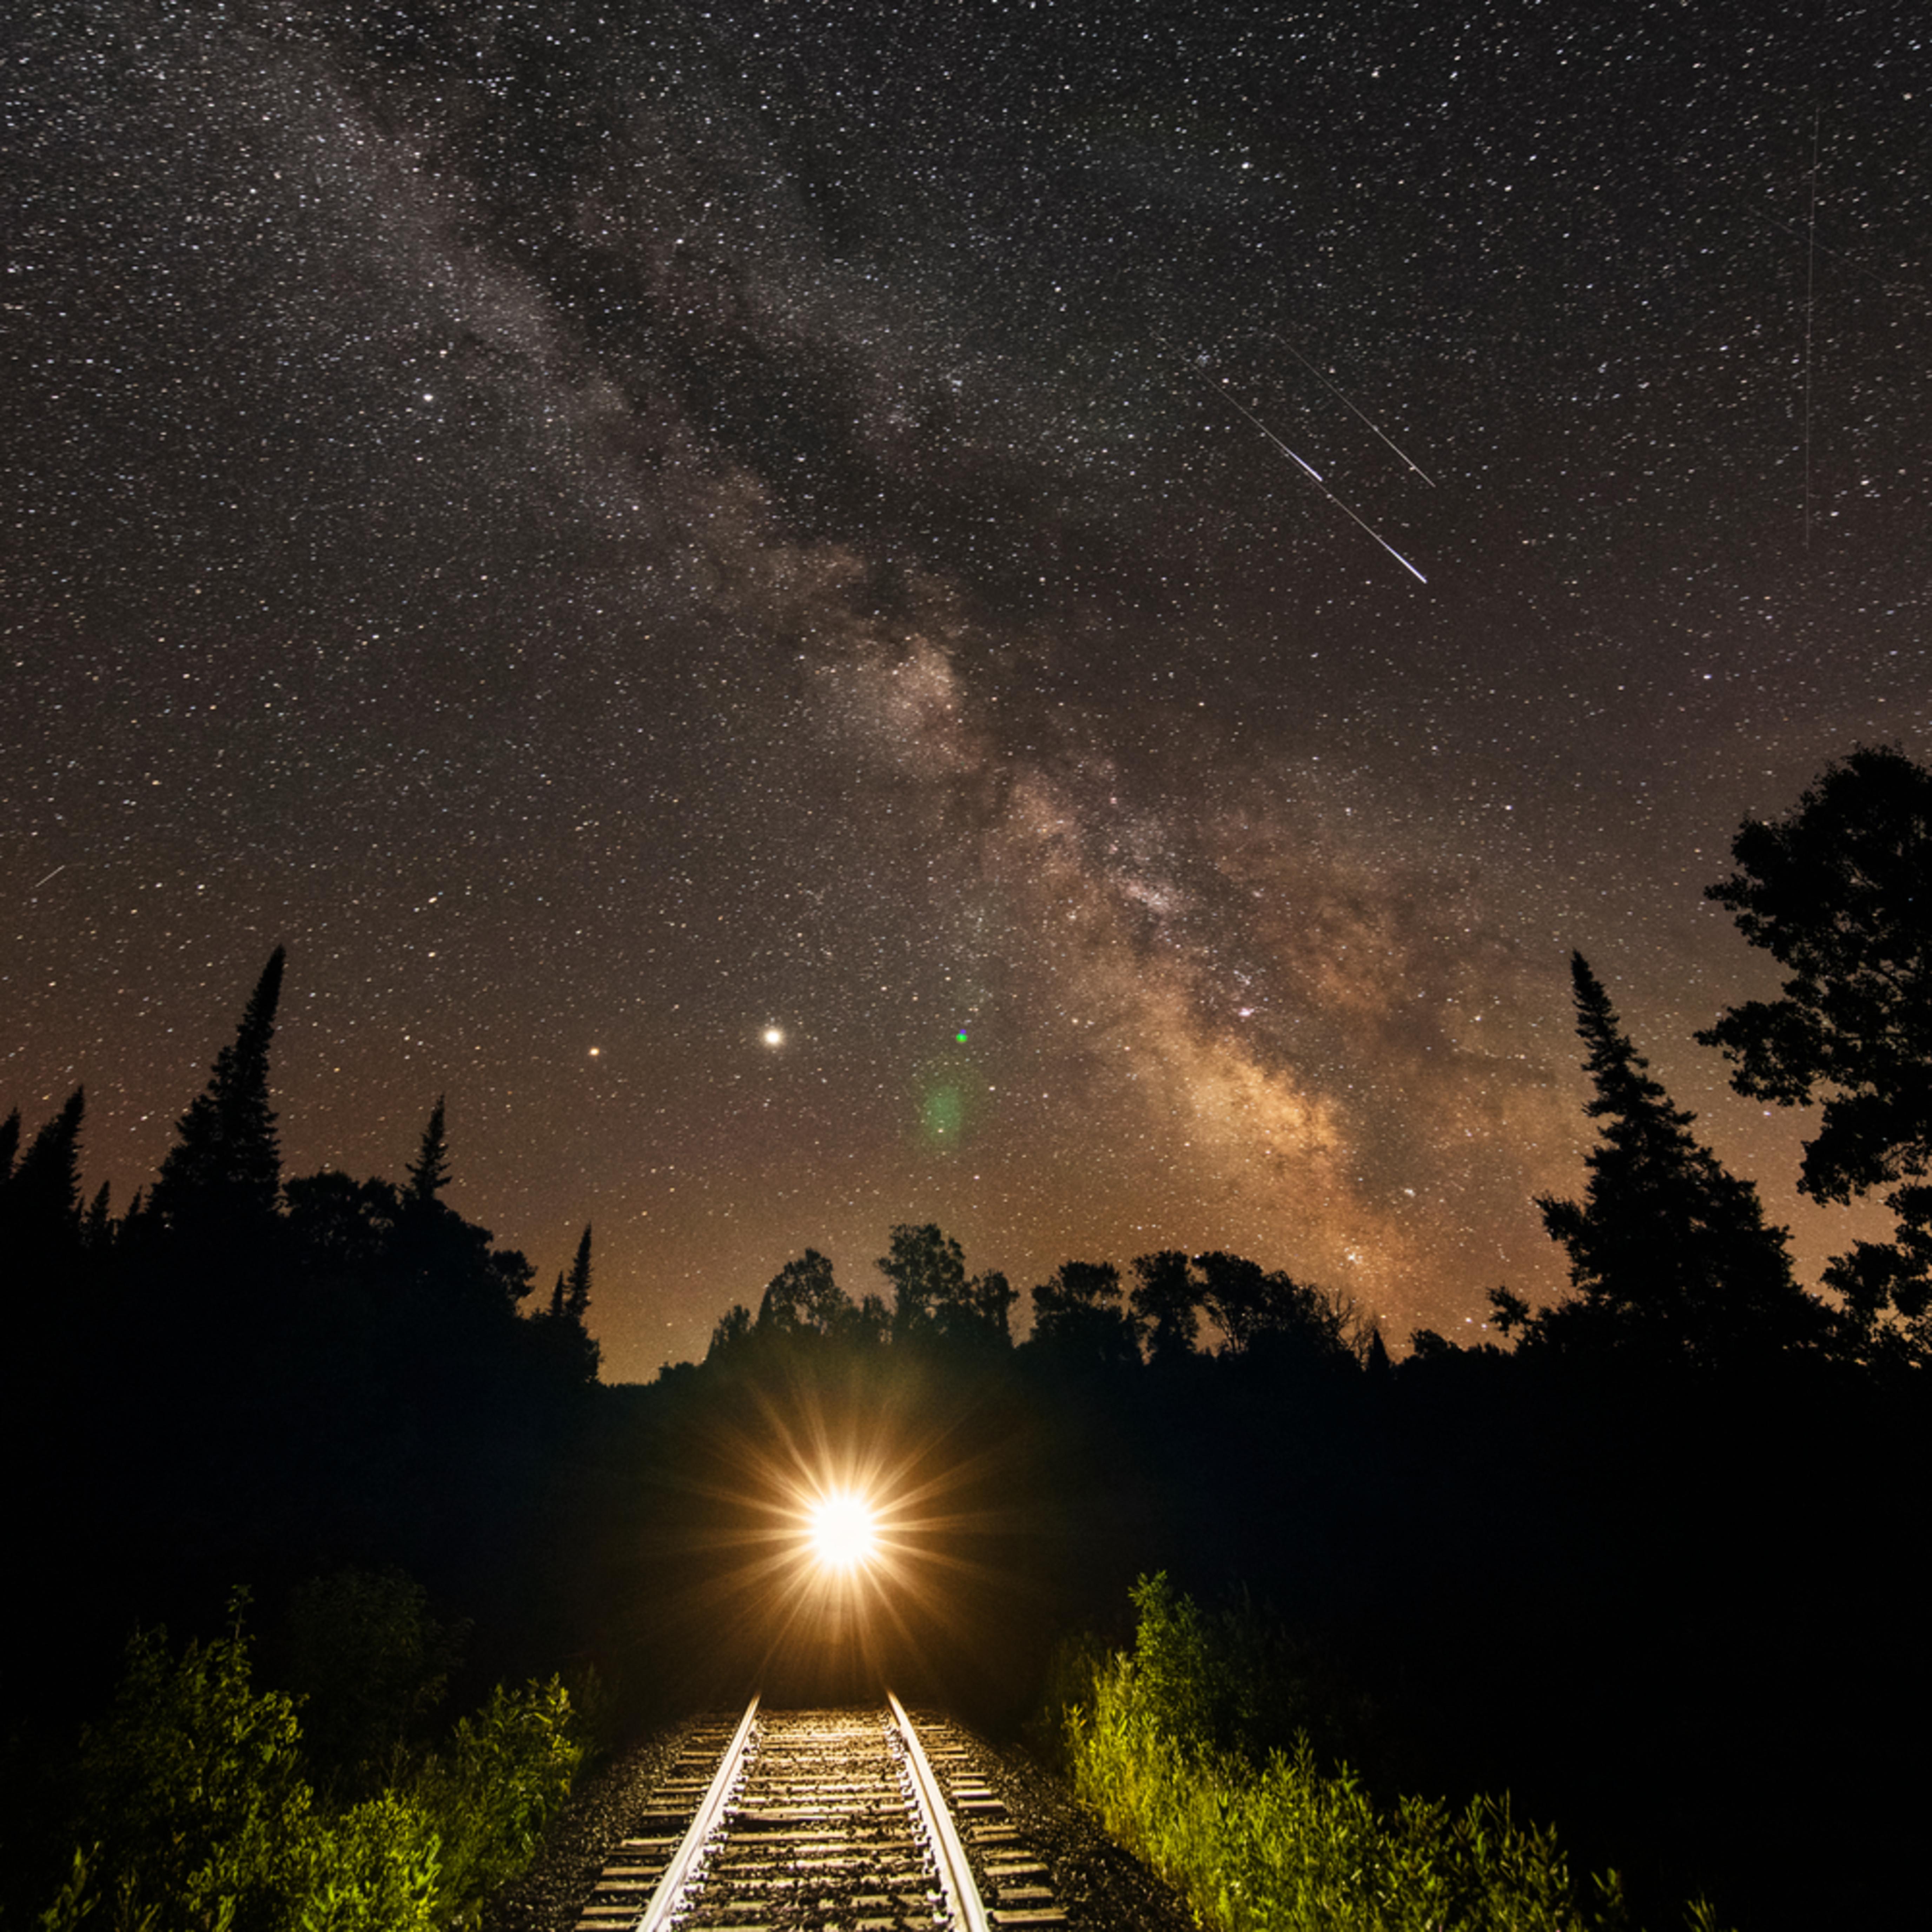 Milky way train horizontal shooting stars nfefv1